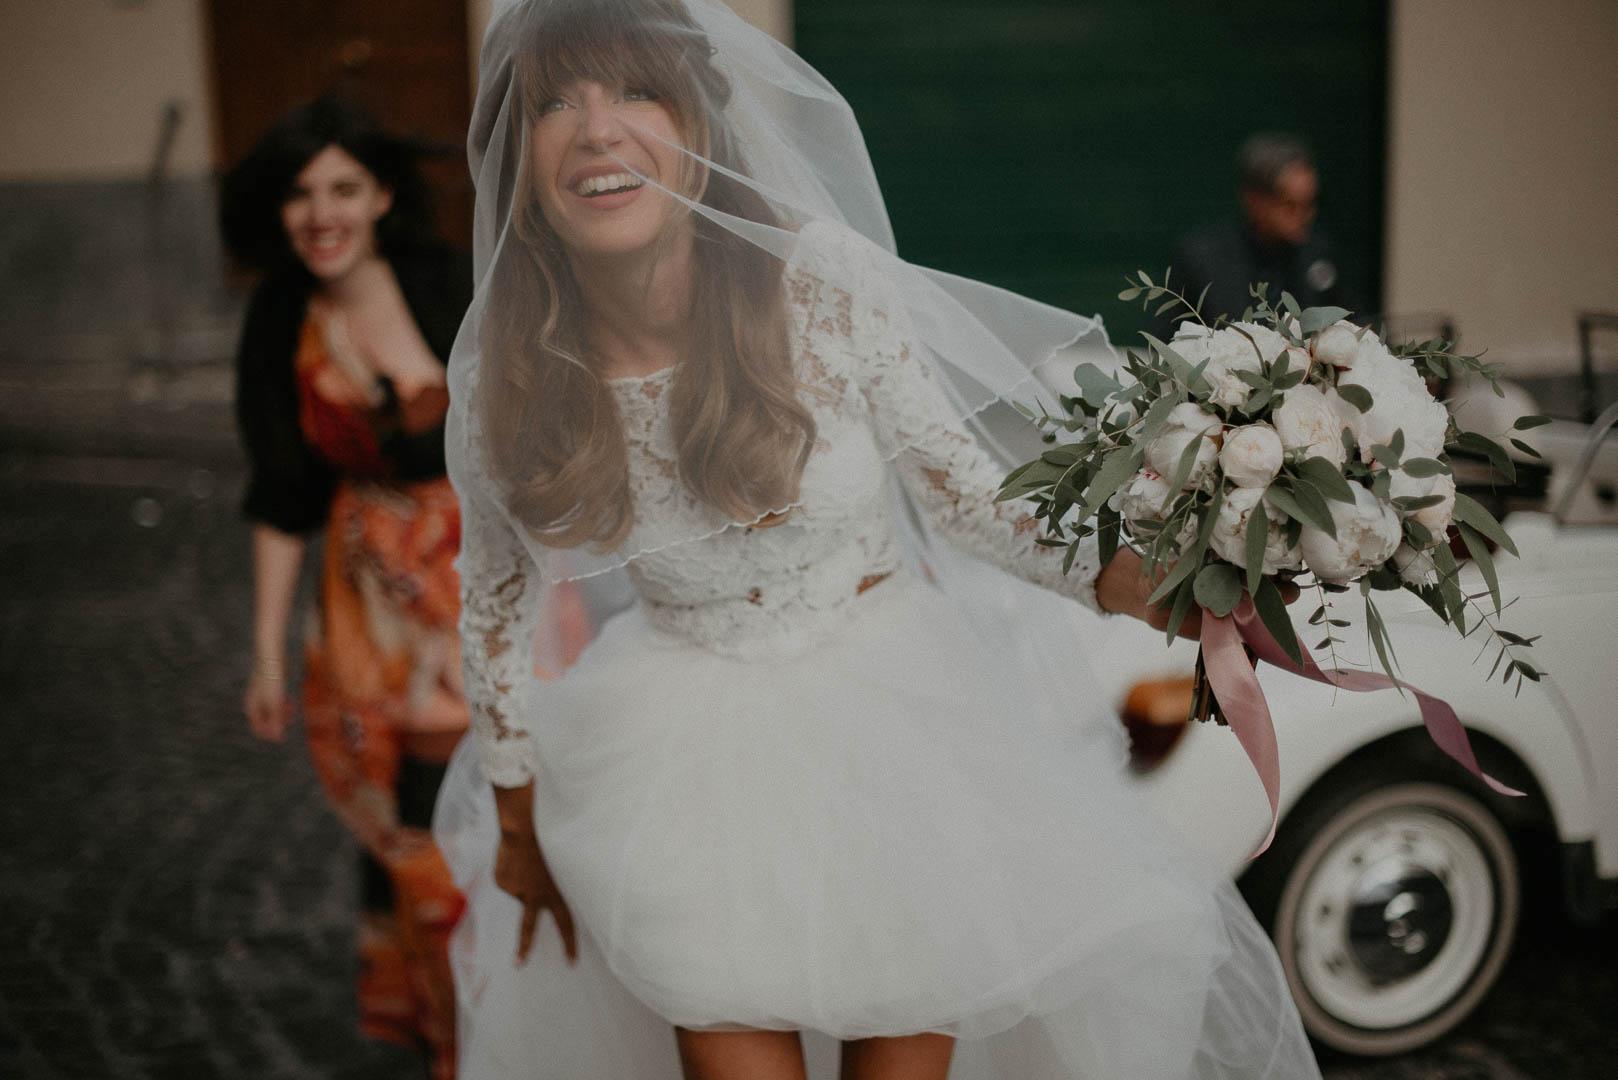 wedding-photographer-destination-fineart-bespoke-reportage-napoli-nabilah-vivianeizzo-spazio46-53